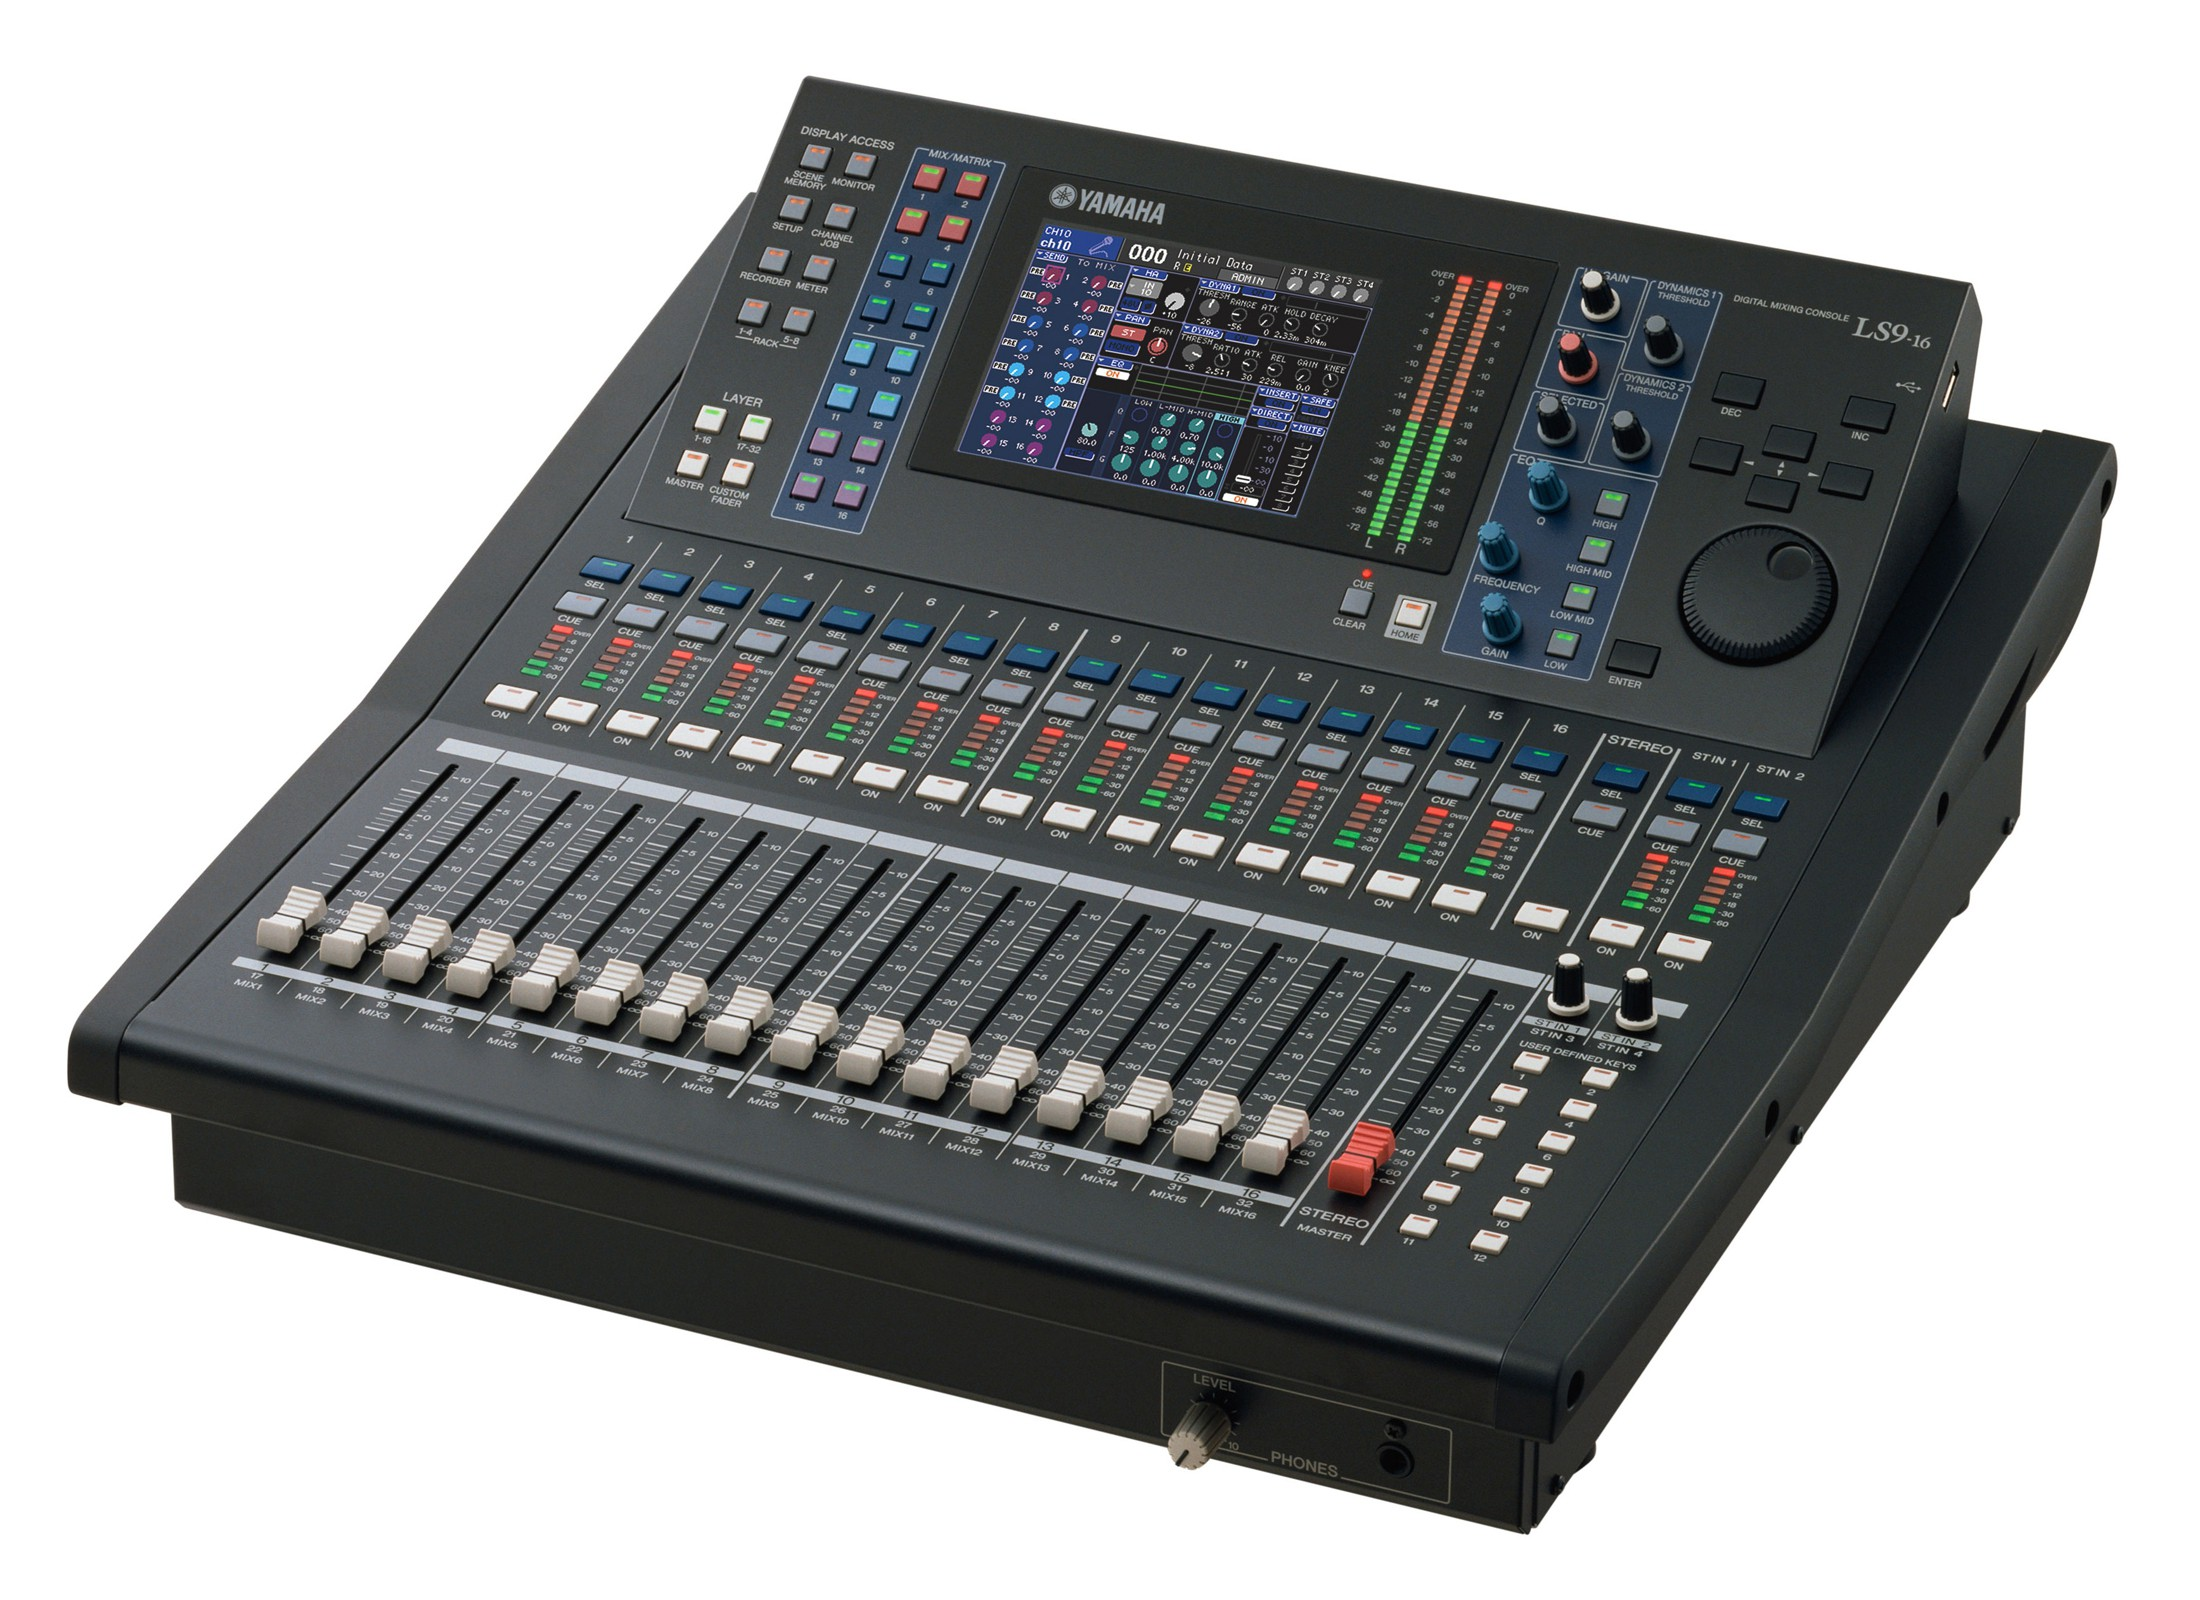 yamaha ls9 16 digital mixer at huss light sound. Black Bedroom Furniture Sets. Home Design Ideas